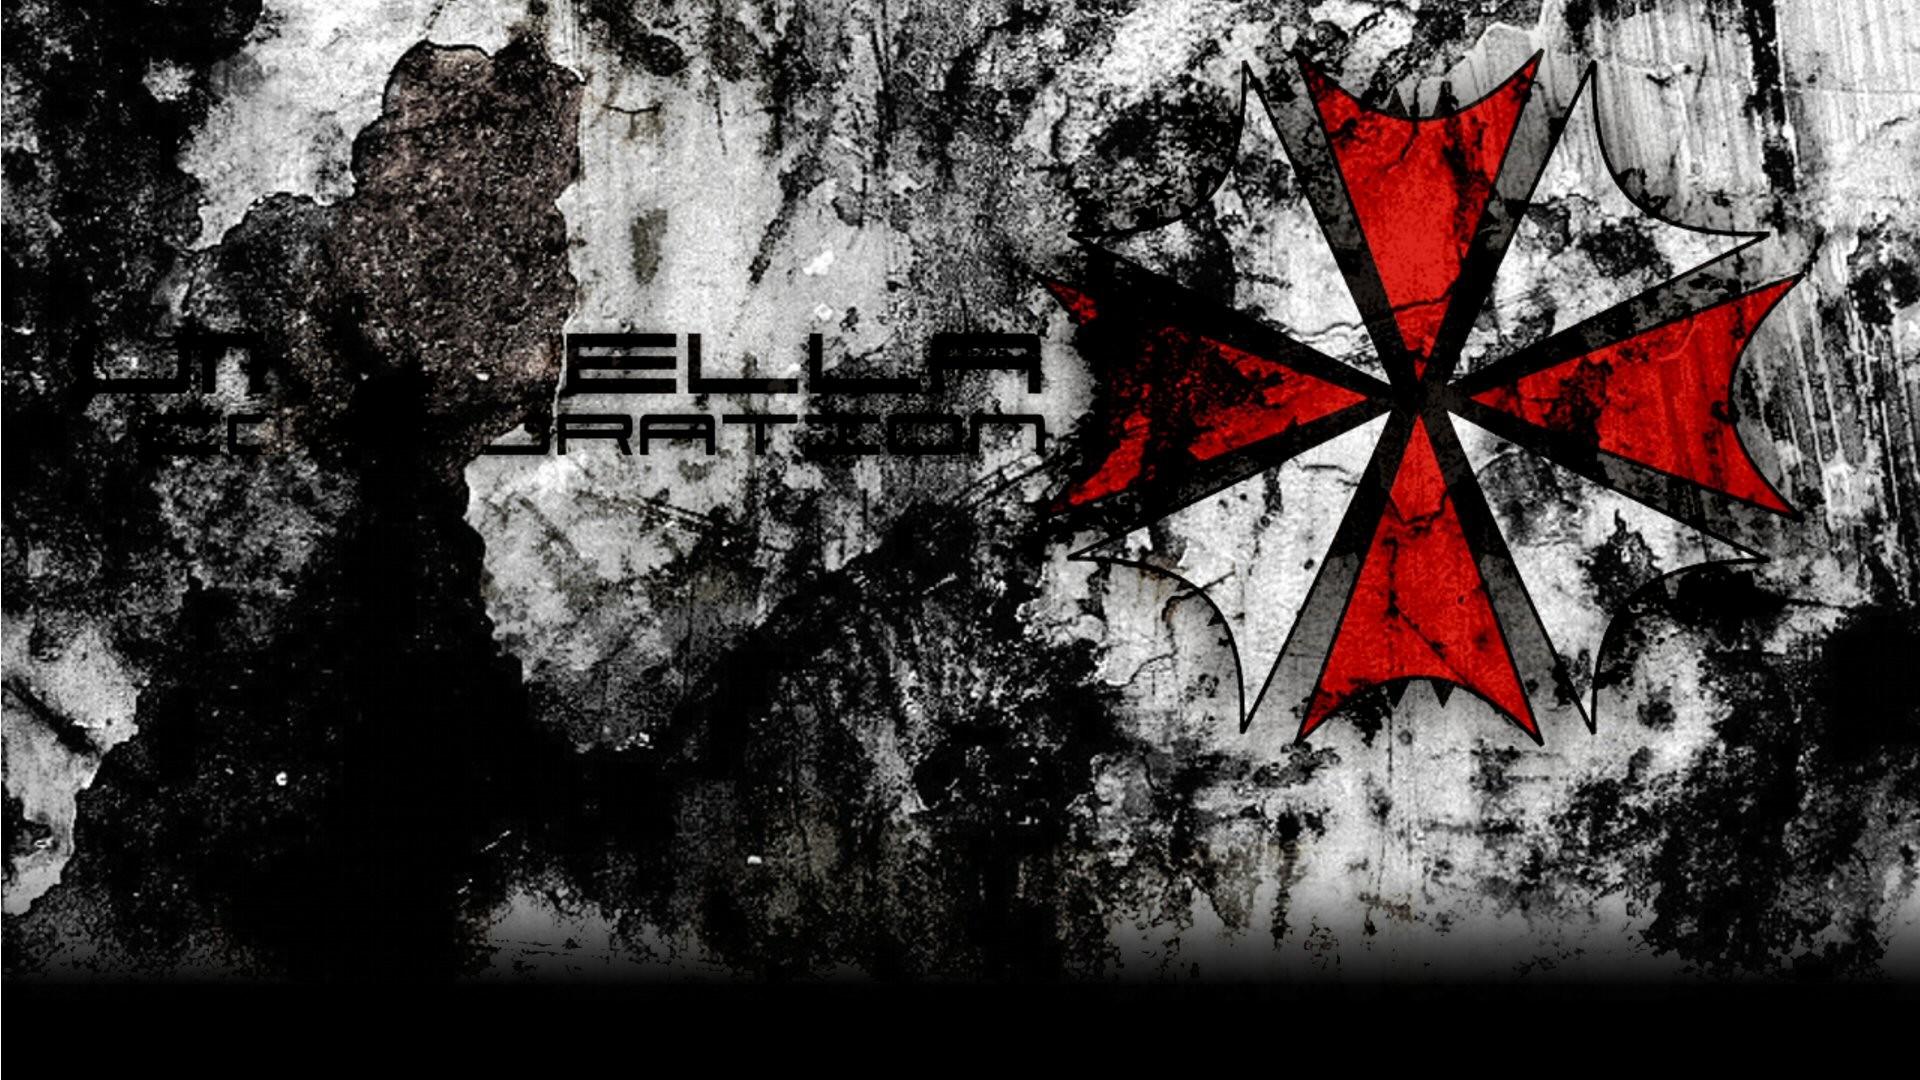 Resident Evil Wallpaper Hd Wallpapertag